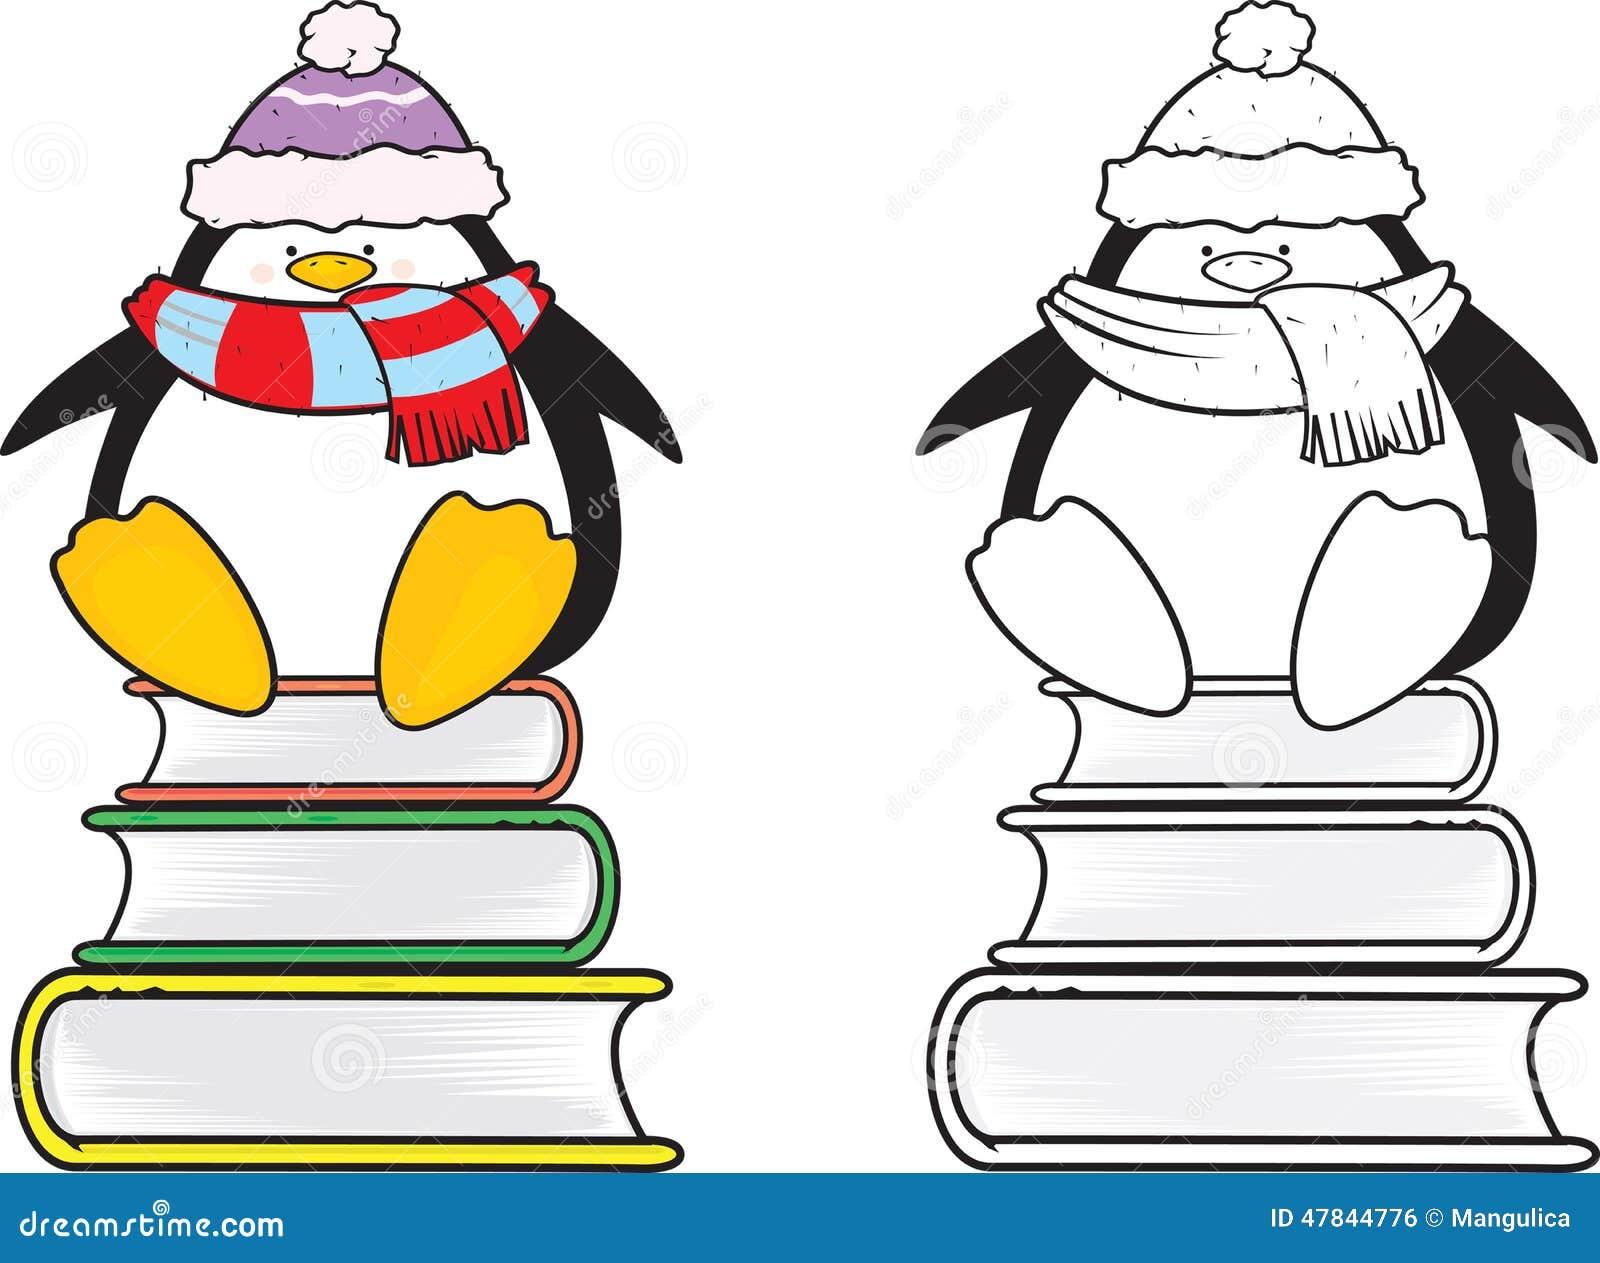 Cute Looking School Penguin Coloring Book